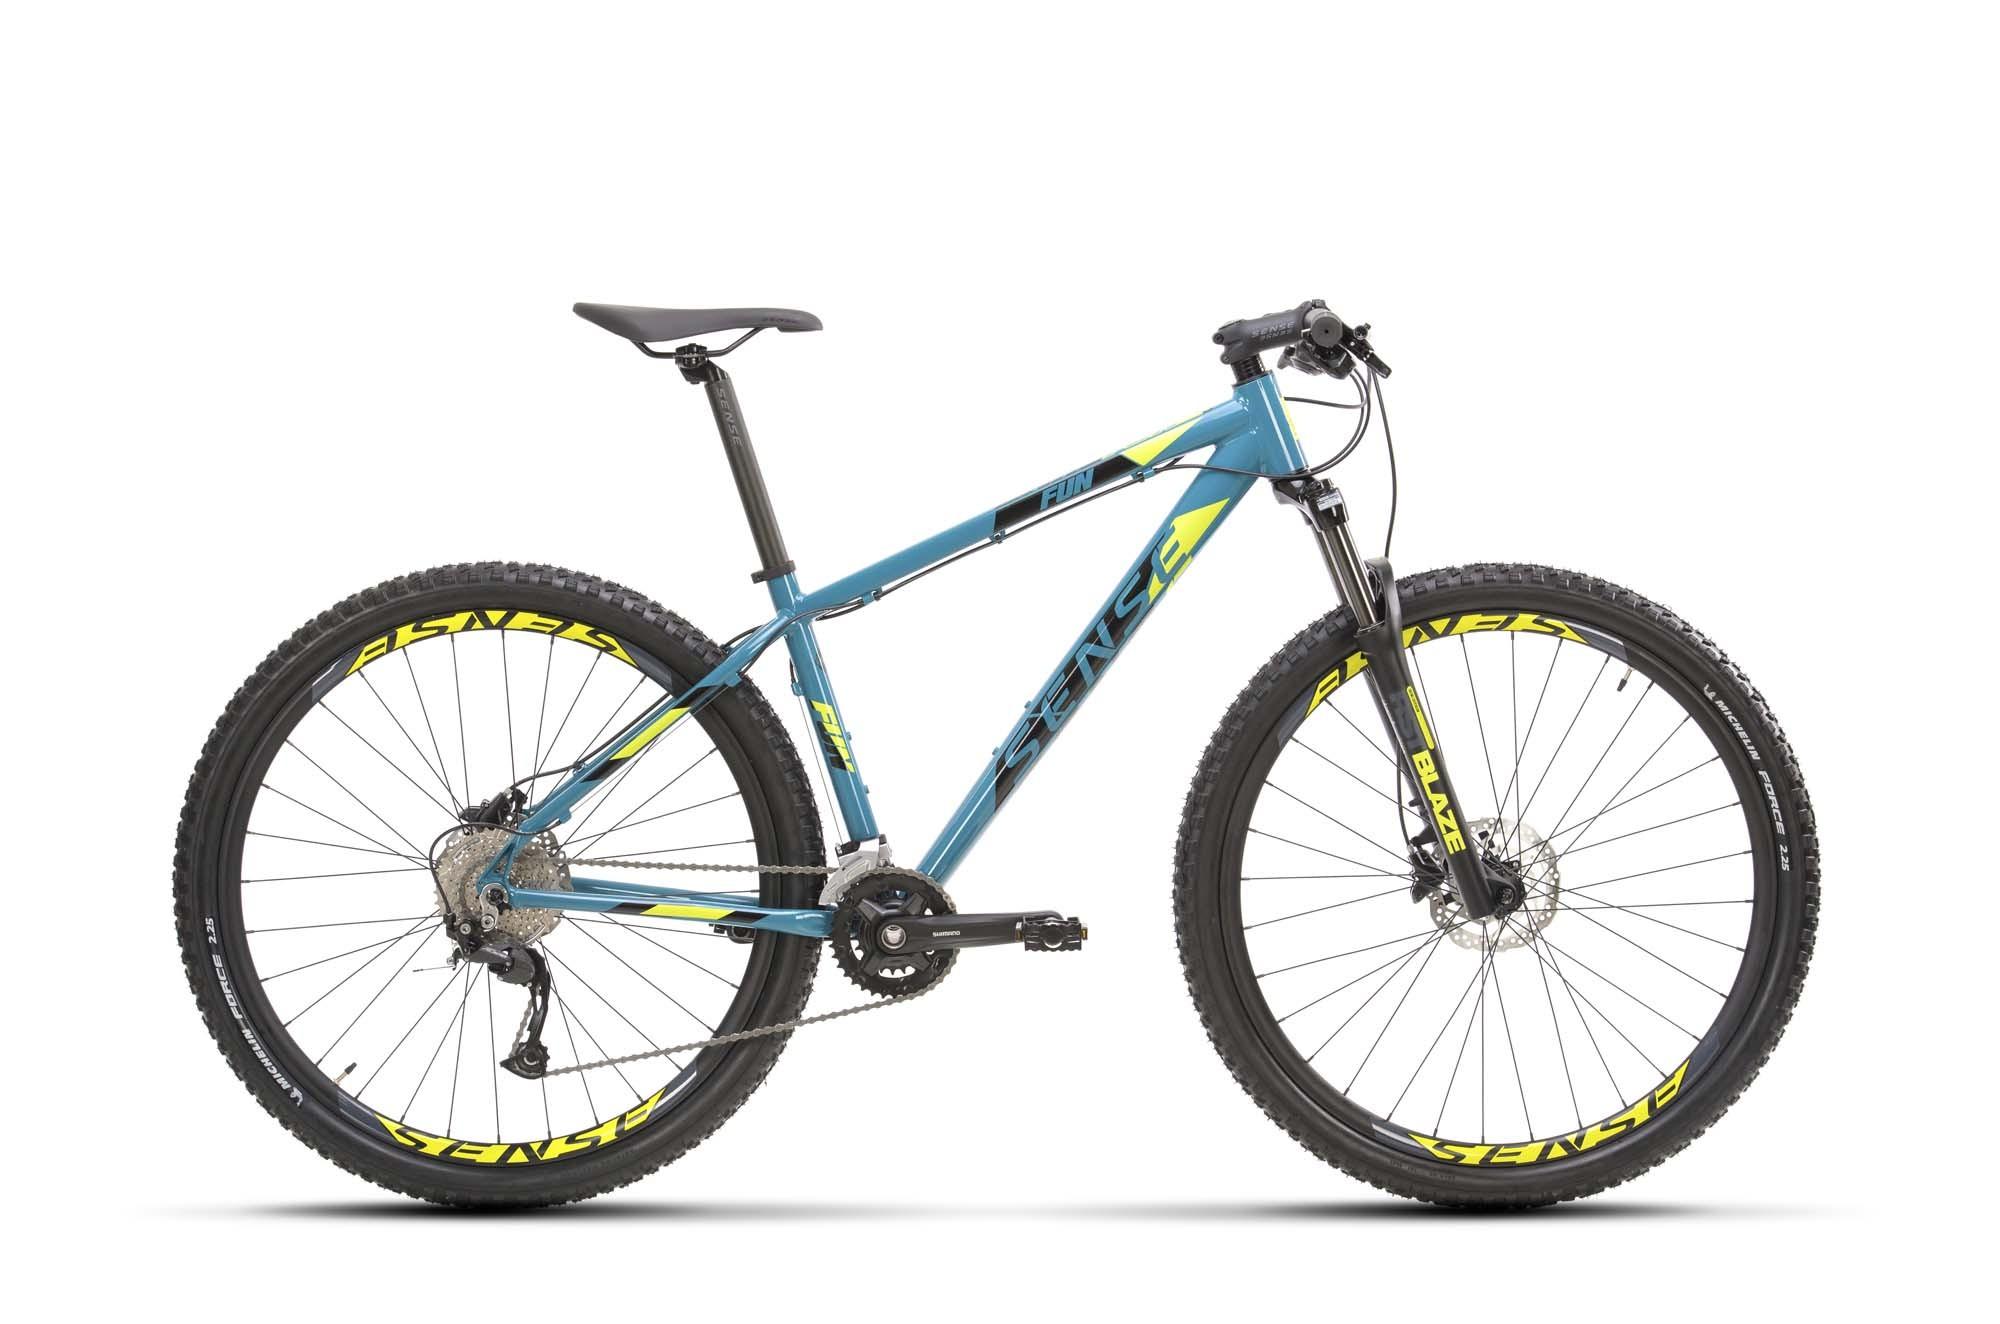 Bicicleta Sense Fun Evo 2021 AQUA/AMR TAM L